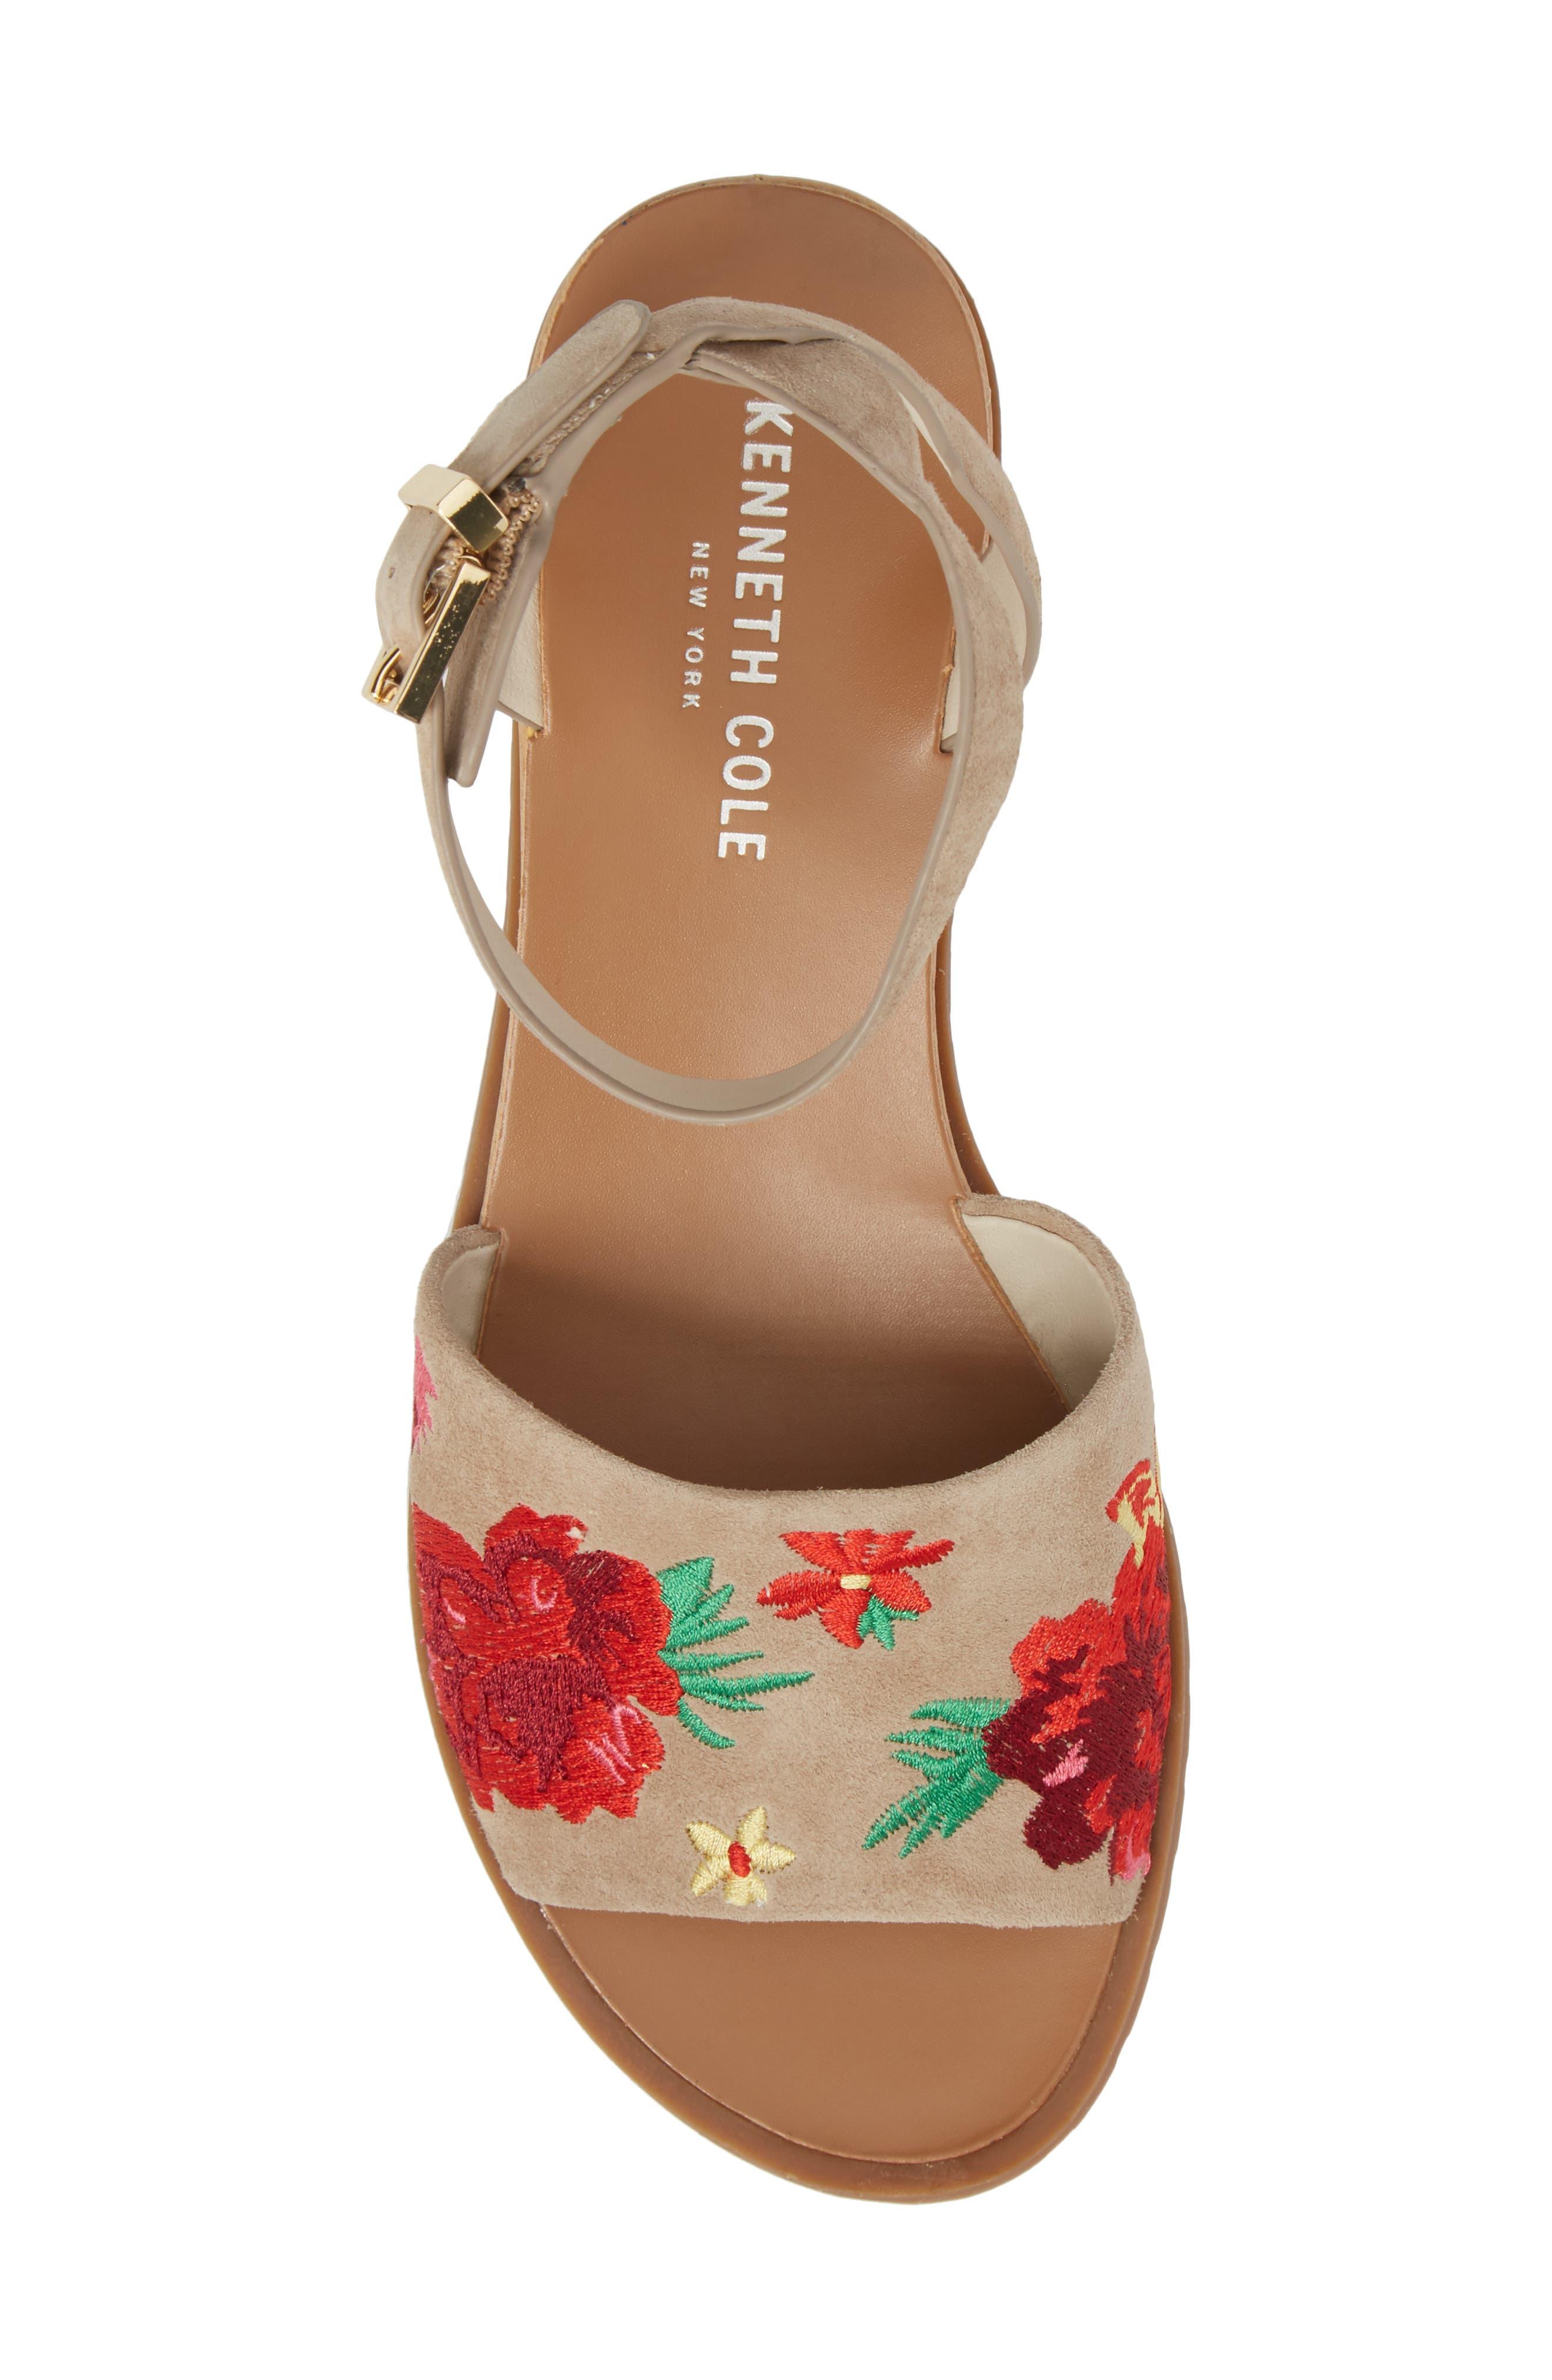 Jinny Ankle Strap Sandal,                             Alternate thumbnail 5, color,                             Tan Faux Suede